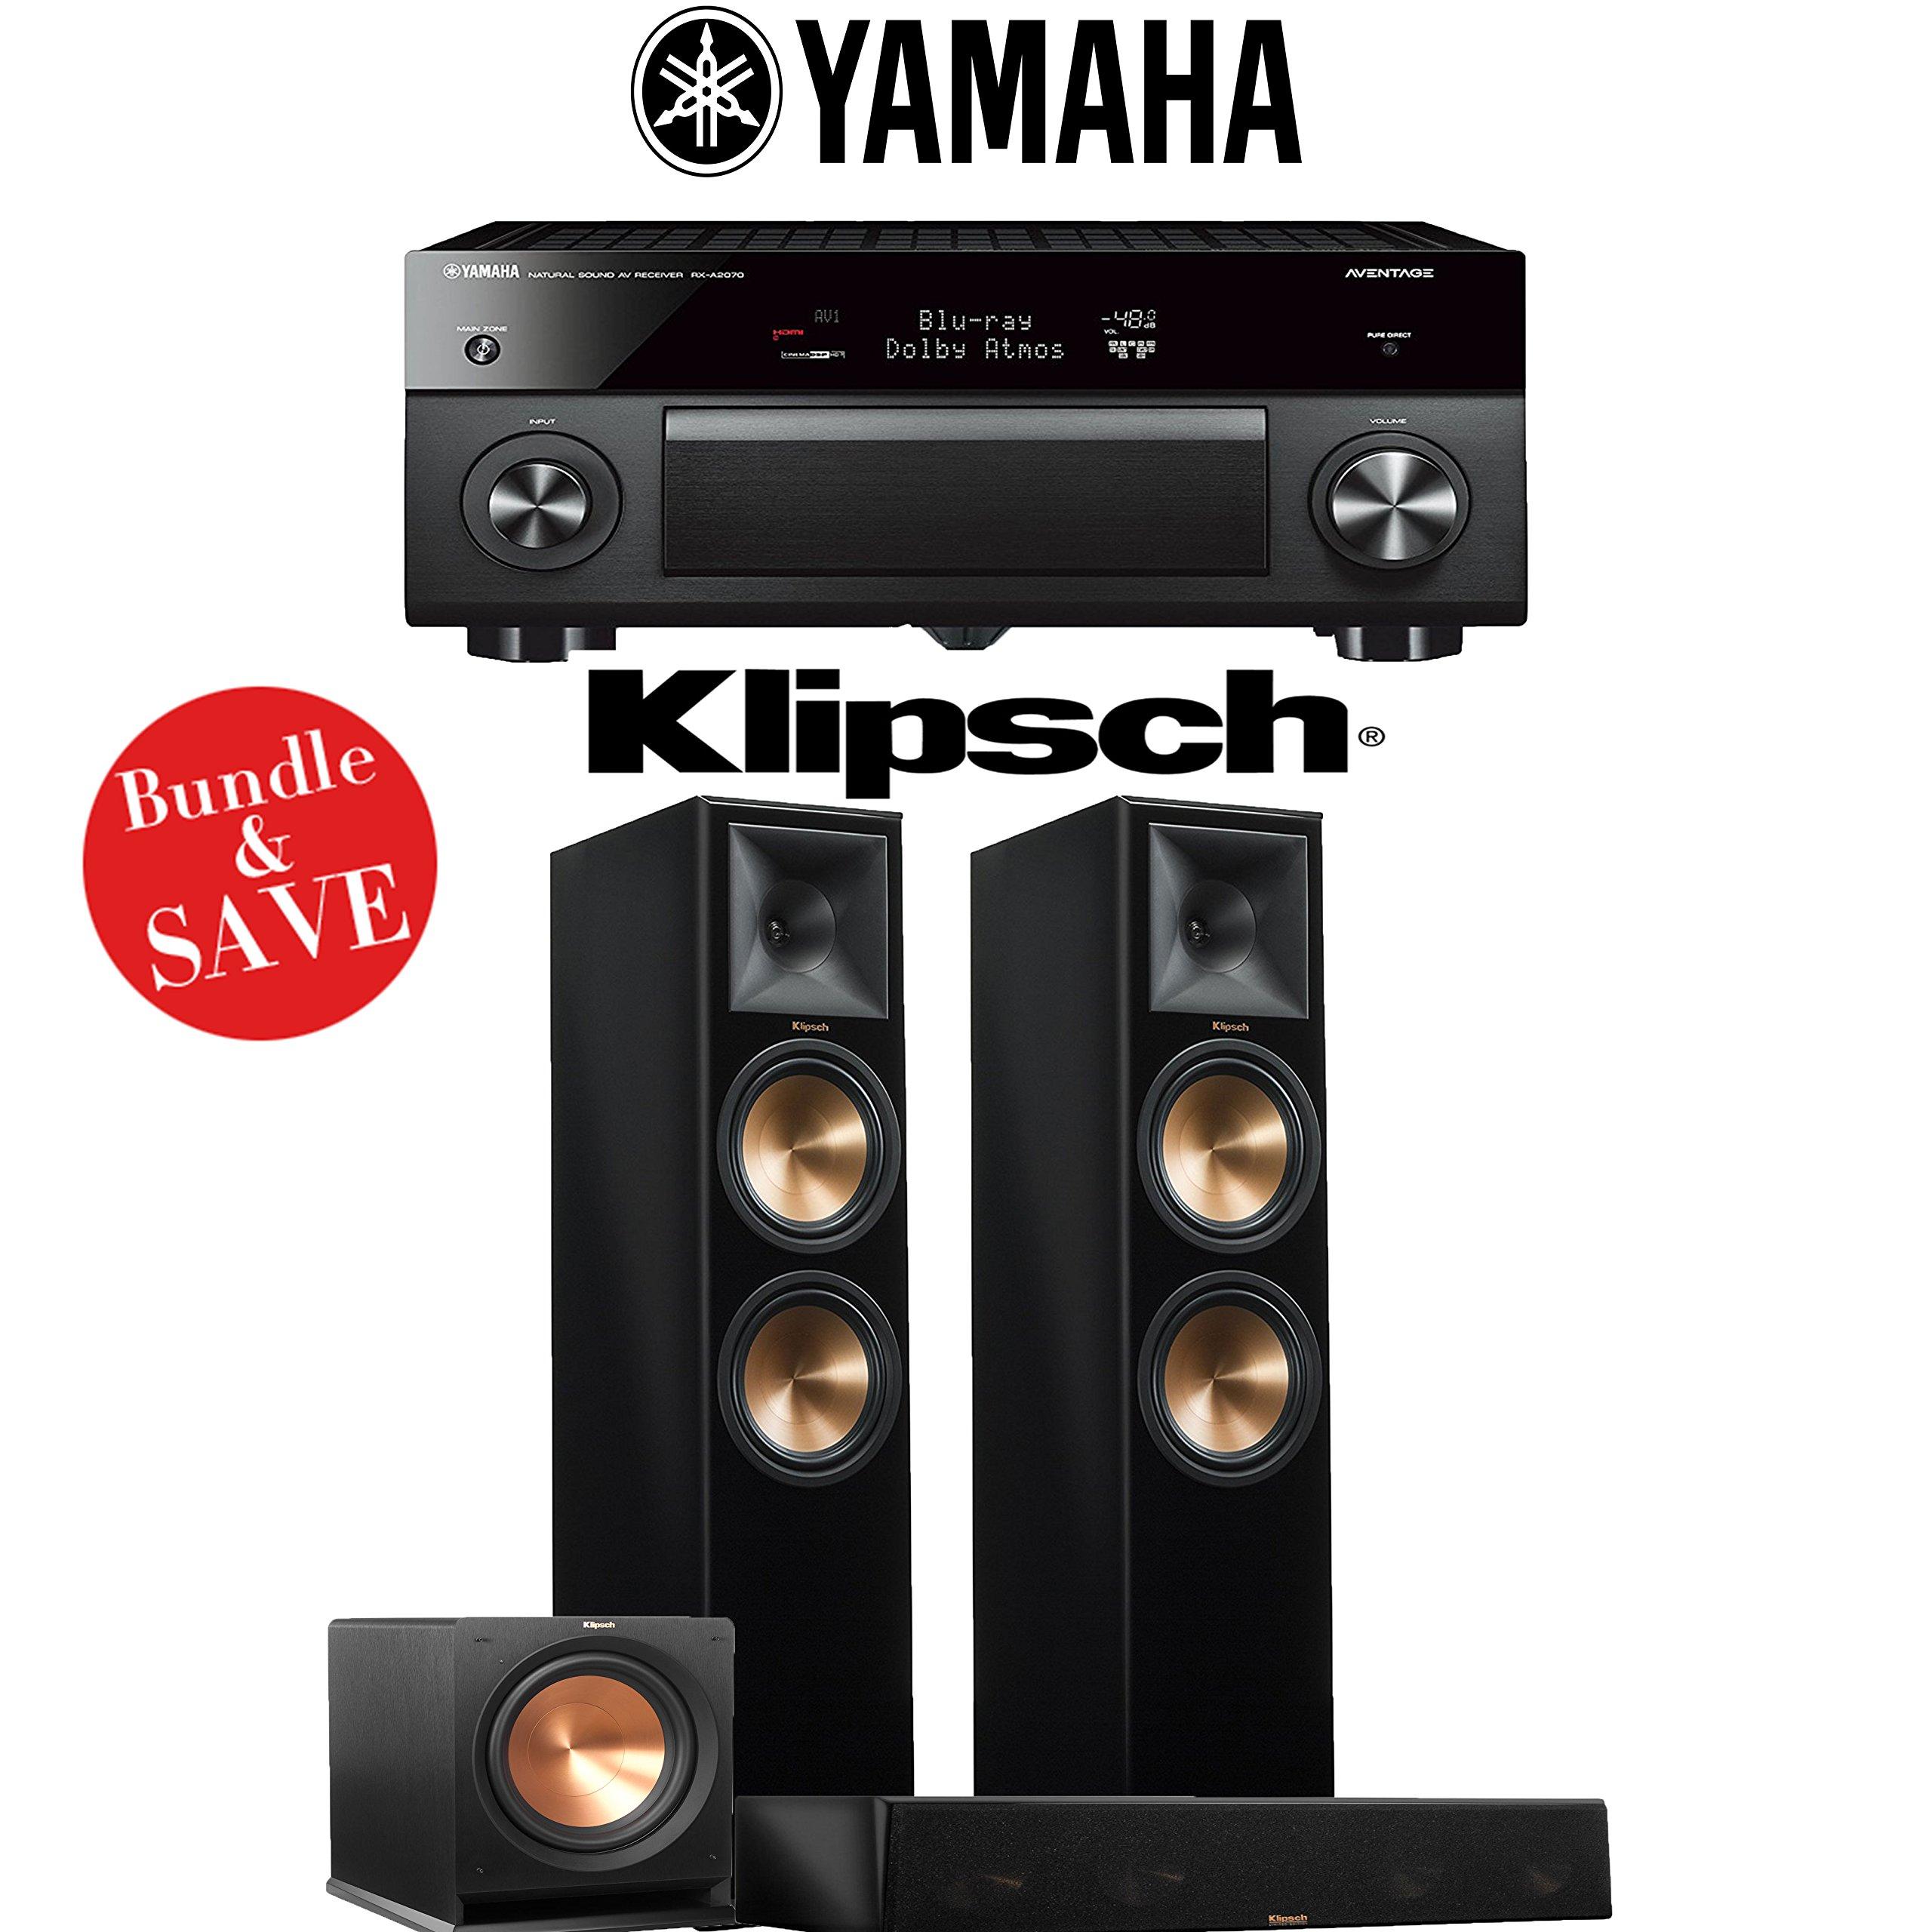 Yamaha AVENTAGE RX-A2070BL 9.2-Ch 4K Network AV Receiver + Klipsch RP-280F + Klipsch RP-450C + Klipsch R-112SW - 3.1-Ch Home Theater Package (Piano Black) by Yamaha